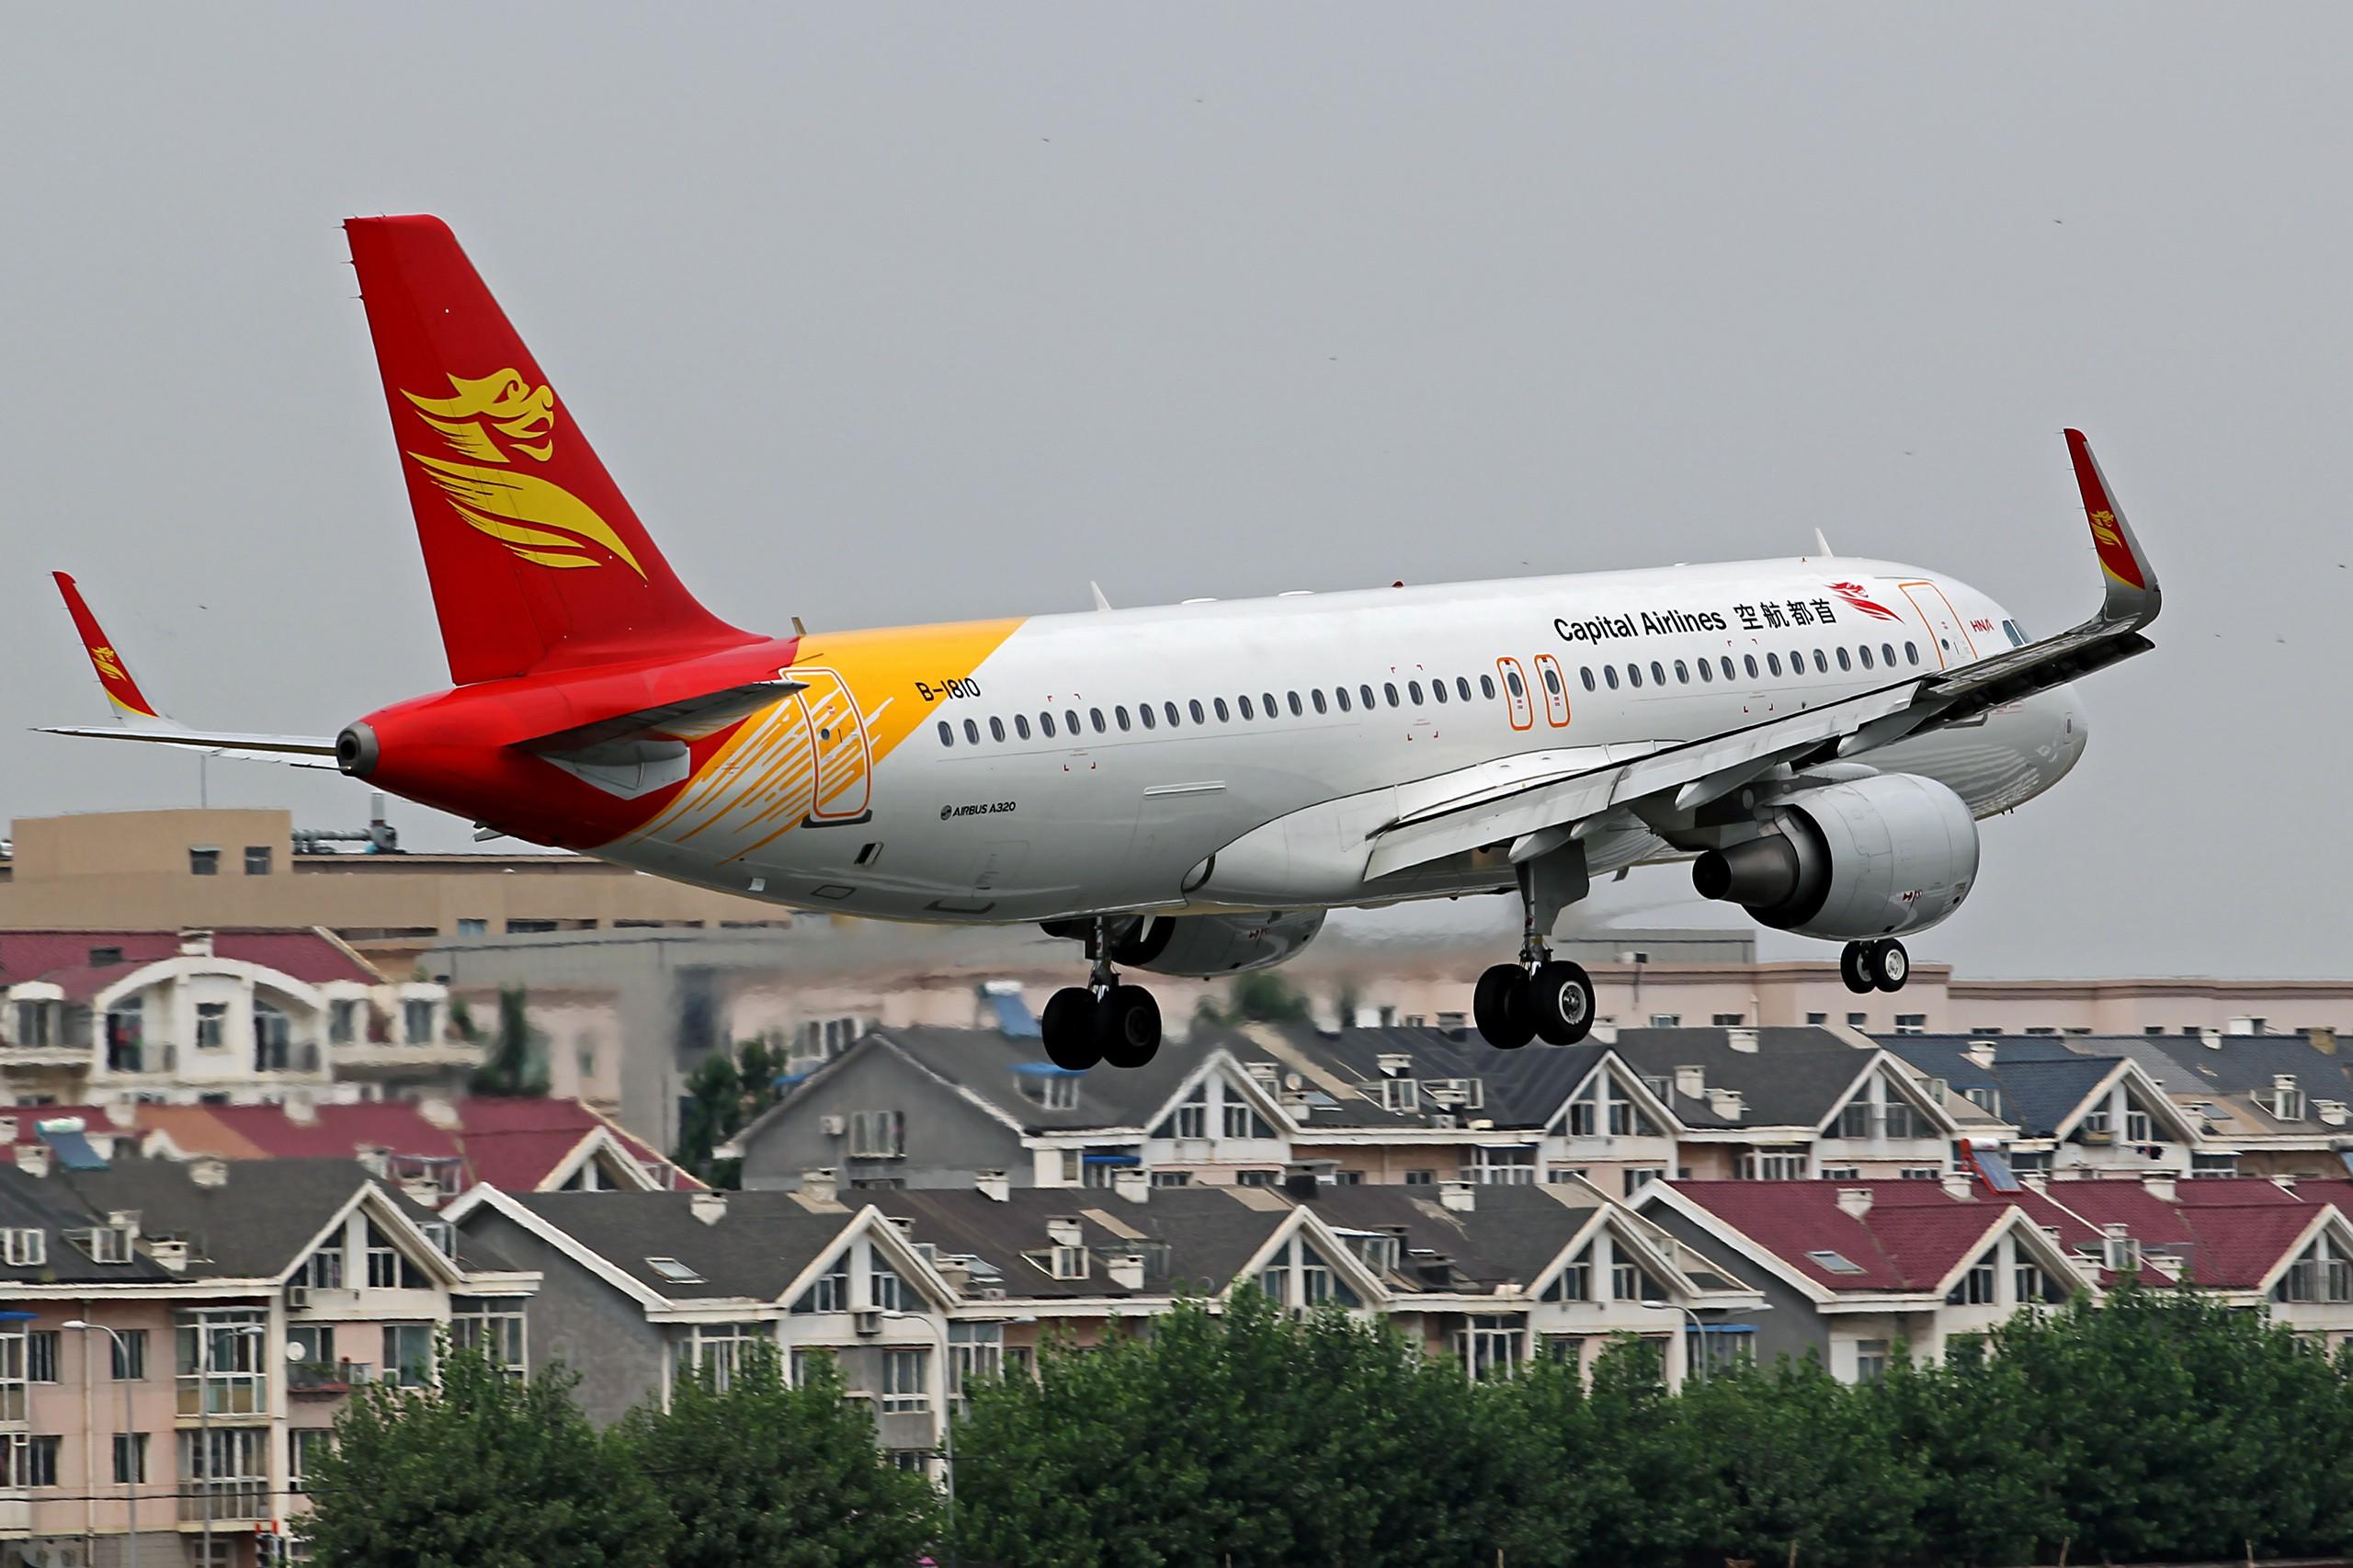 Re:[原创][DLC]...窄体机...2560x1707}Pix AIRBUS A320-200 B-1810 中国大连周水子国际机场